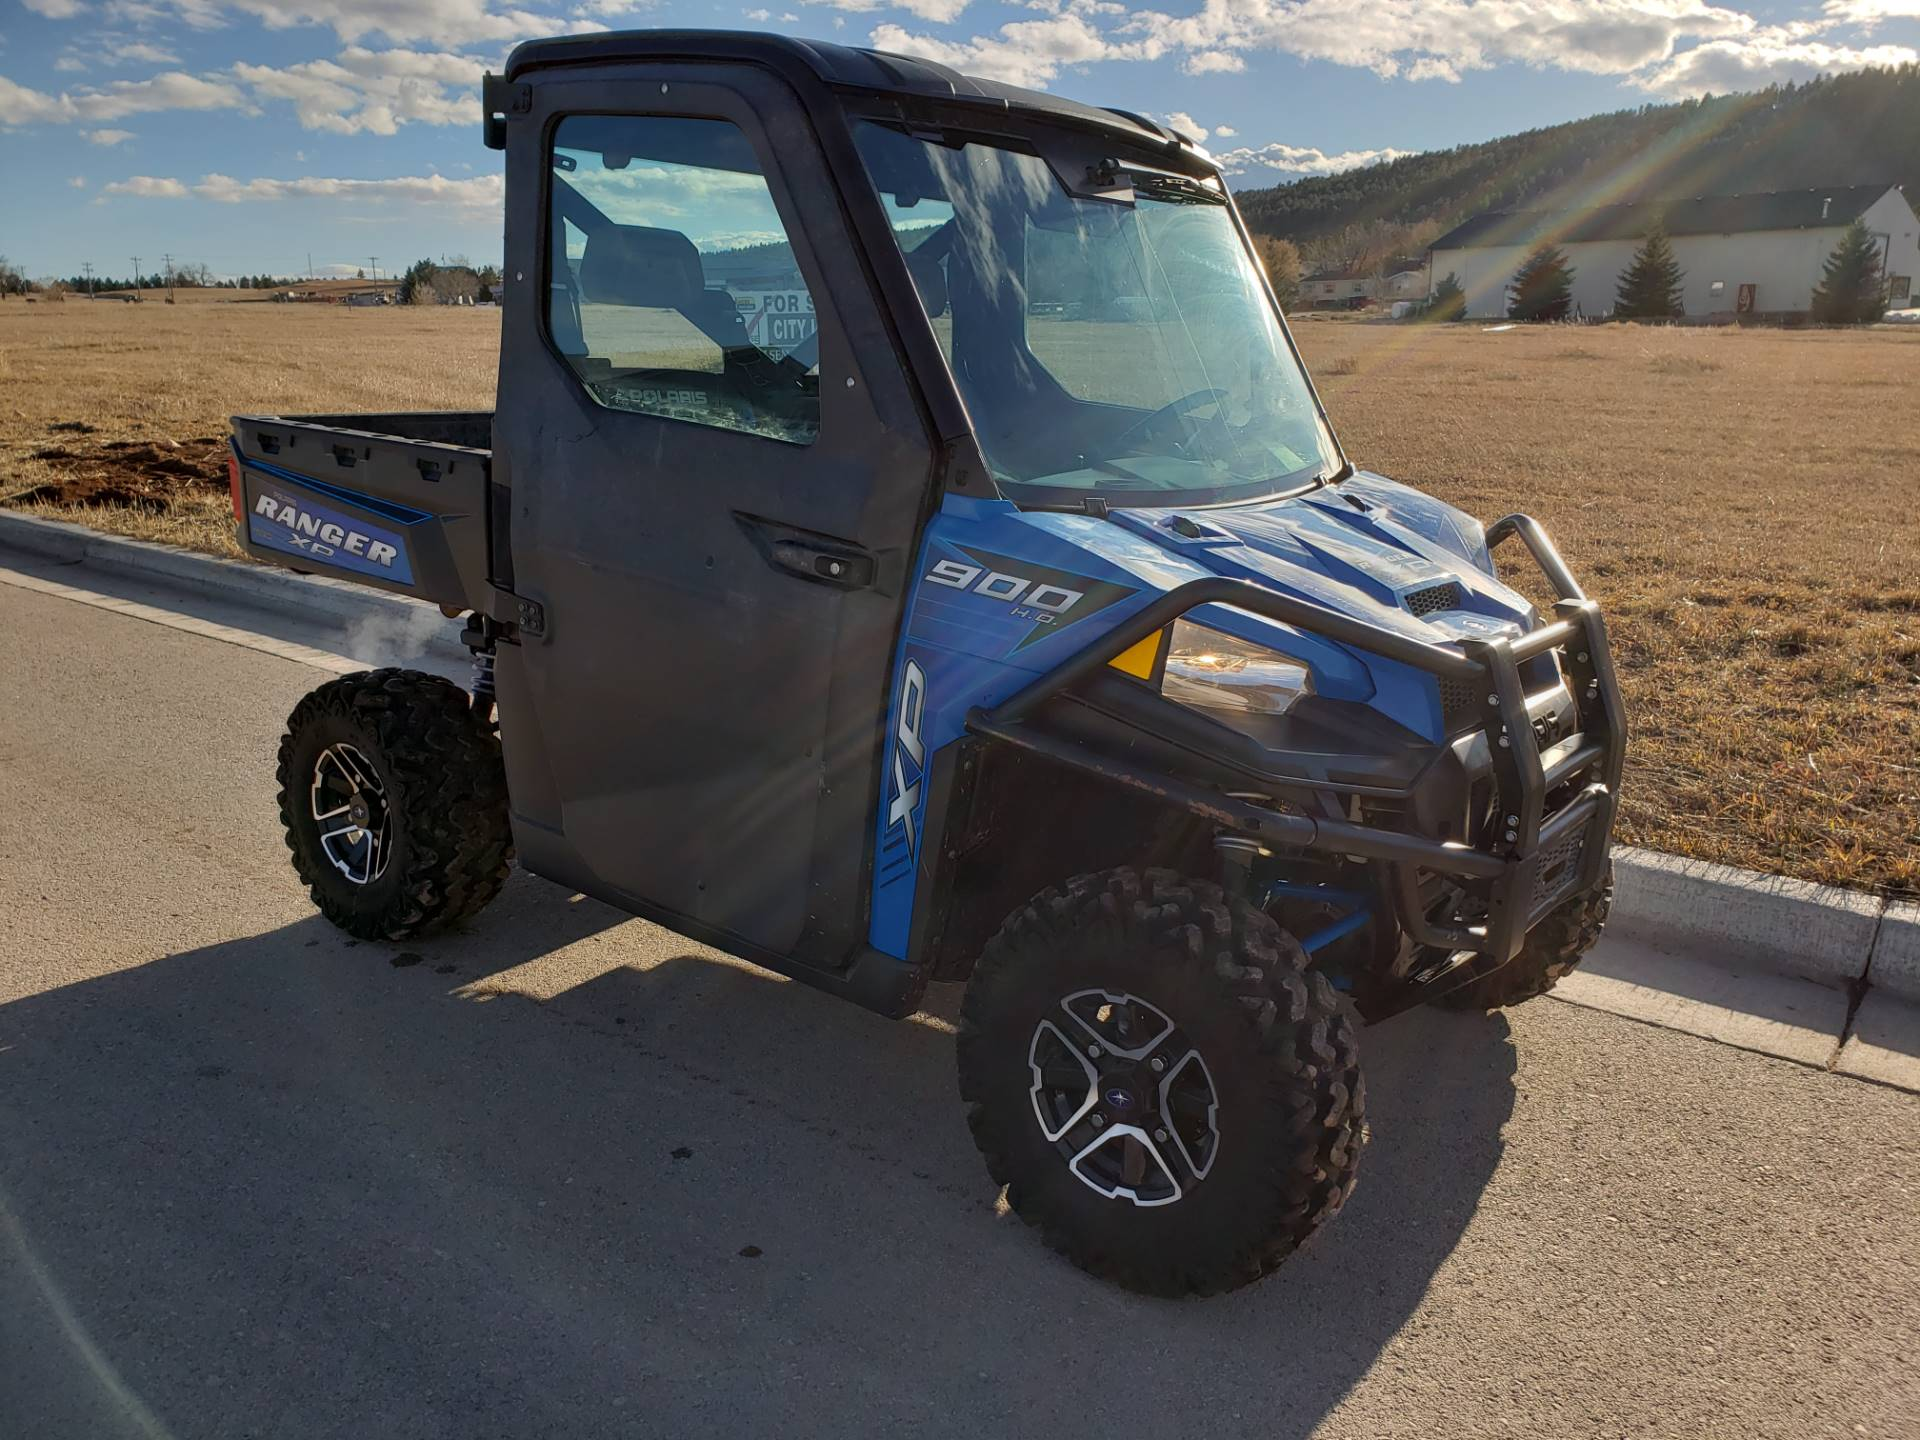 2016 Polaris Ranger Xp 900 Eps In Rapid City South Dakota